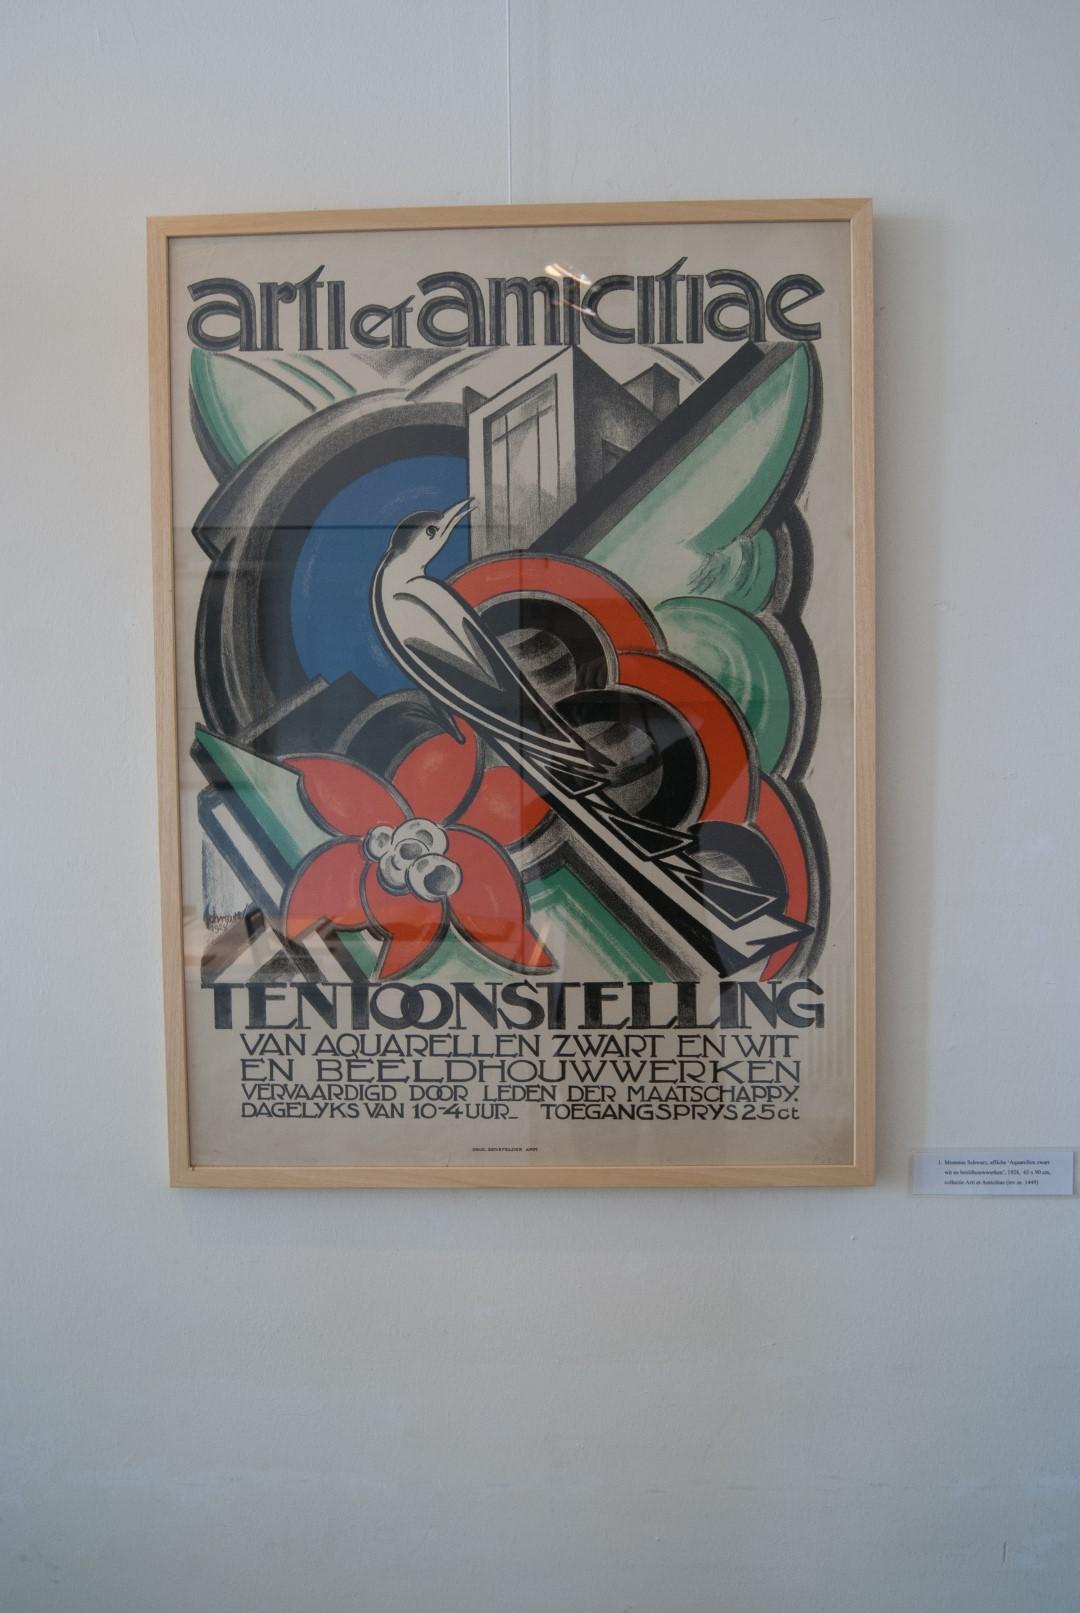 [1]: Mommie Schwarz, Affiche Aquarellen zwart wit en beeldhouwwerken, 1928